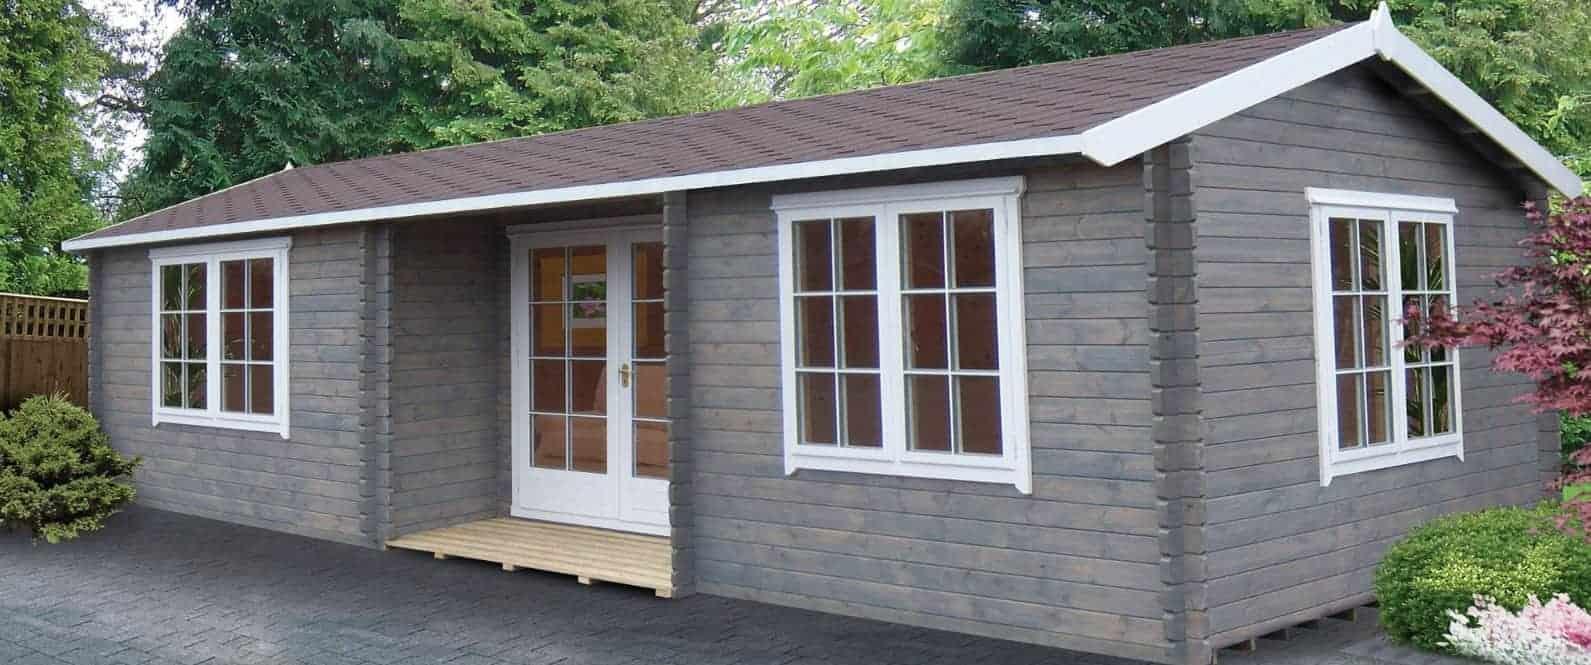 Palmako Sandra 7.5m x 4.8m Log Cabin Summerhouse (44mm)